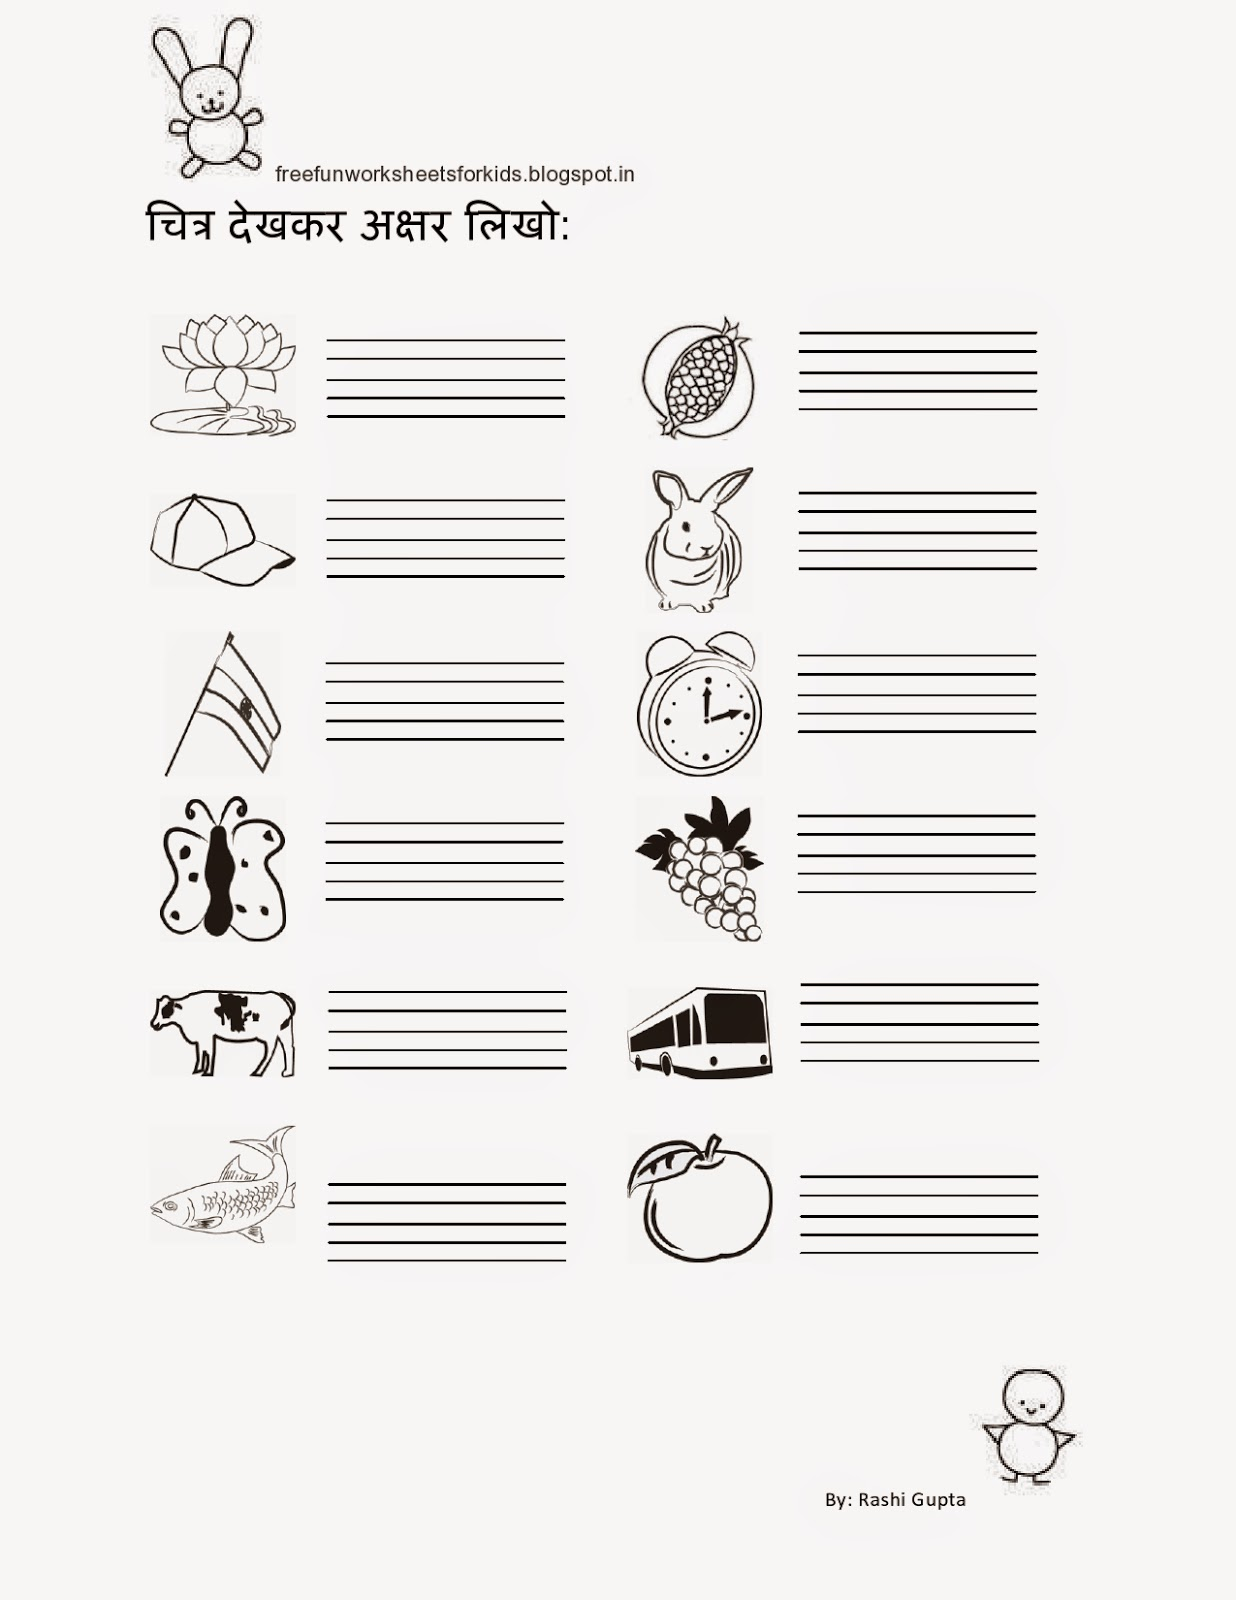 Free Fun Worksheets For Kids: Free Printable Fun Hindi Worksheets for Class  KG - चित्र देखकर अक्षर लिखो [ 1600 x 1236 Pixel ]